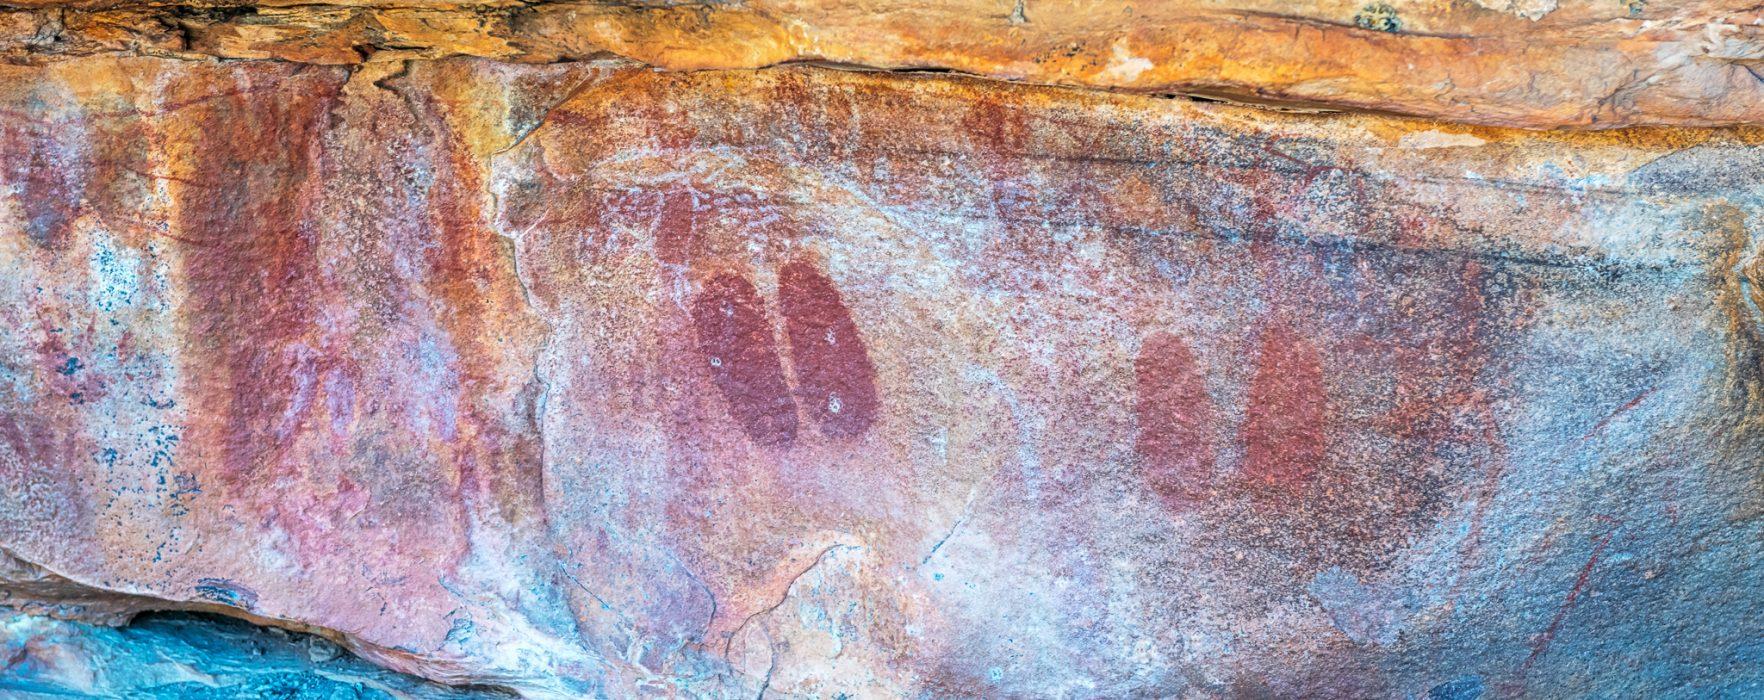 #752. The Kimberley Coast – North Western Australia